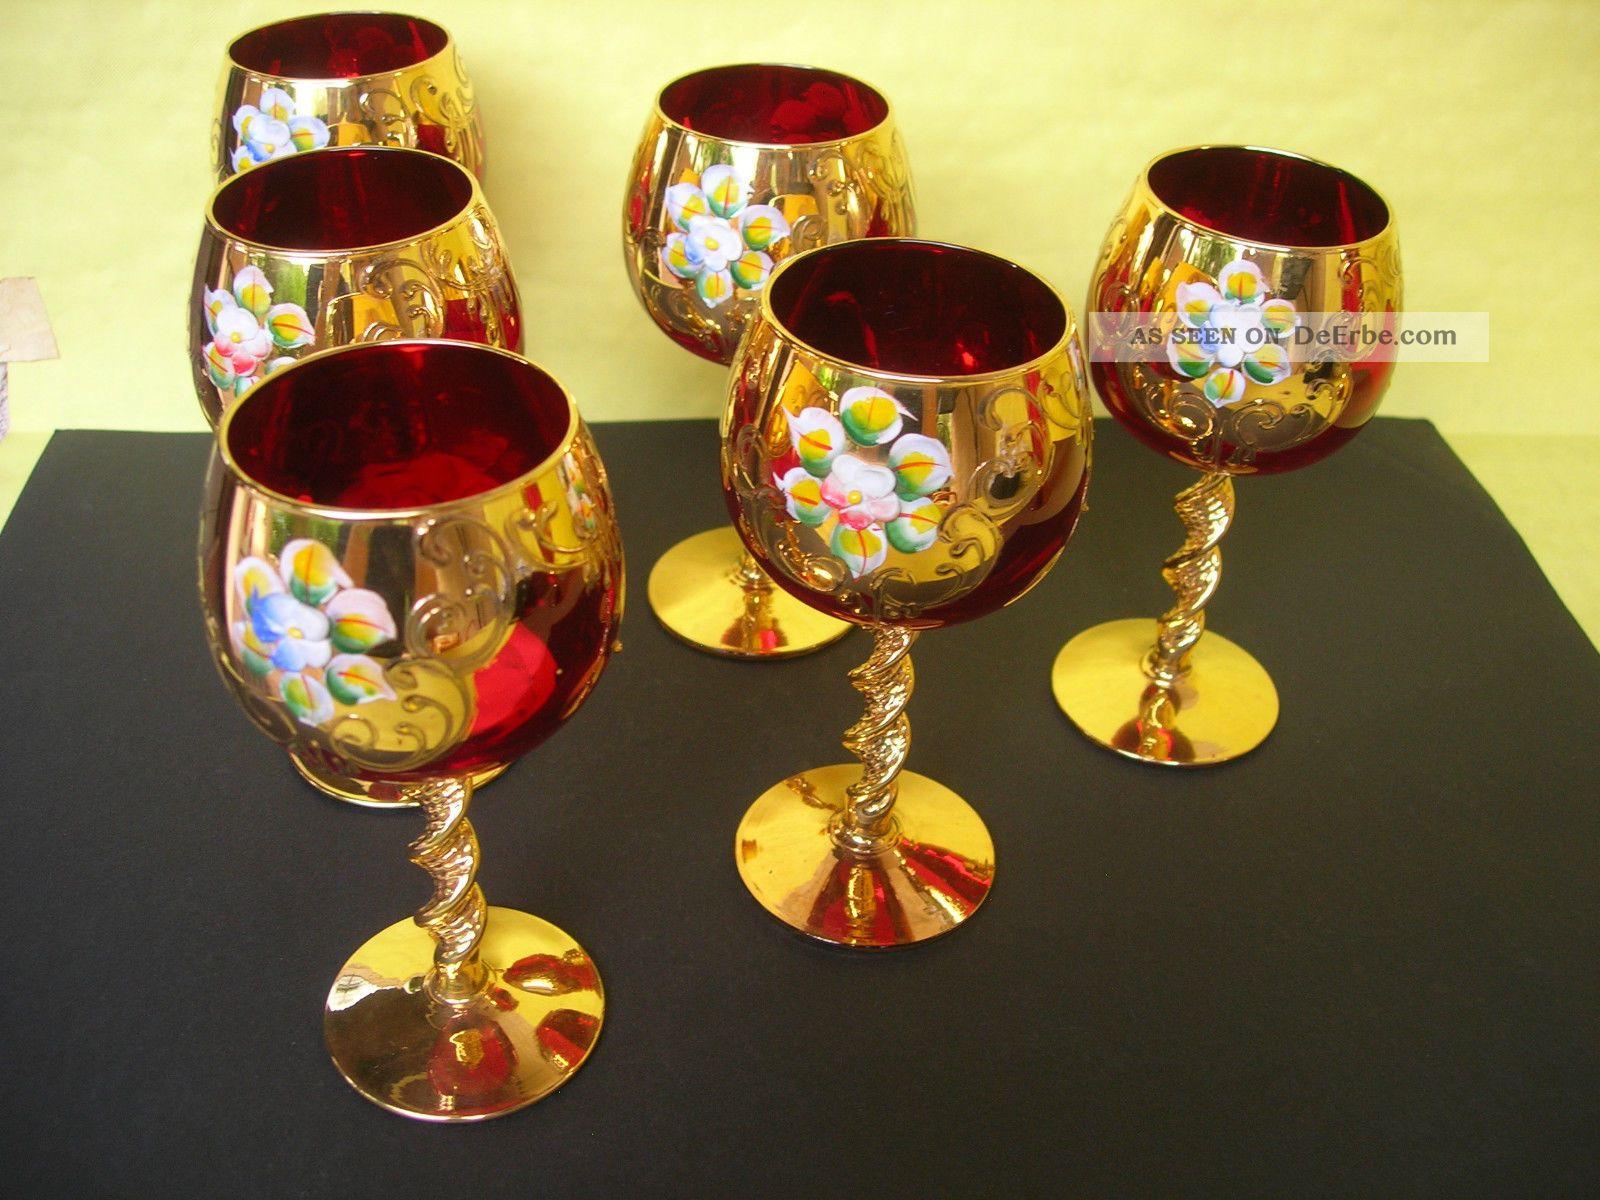 Murano Lik 246 Rservice Service Karaffe Und 6 Rote Gl 228 Ser Rubinrotes Glas Vergoldet